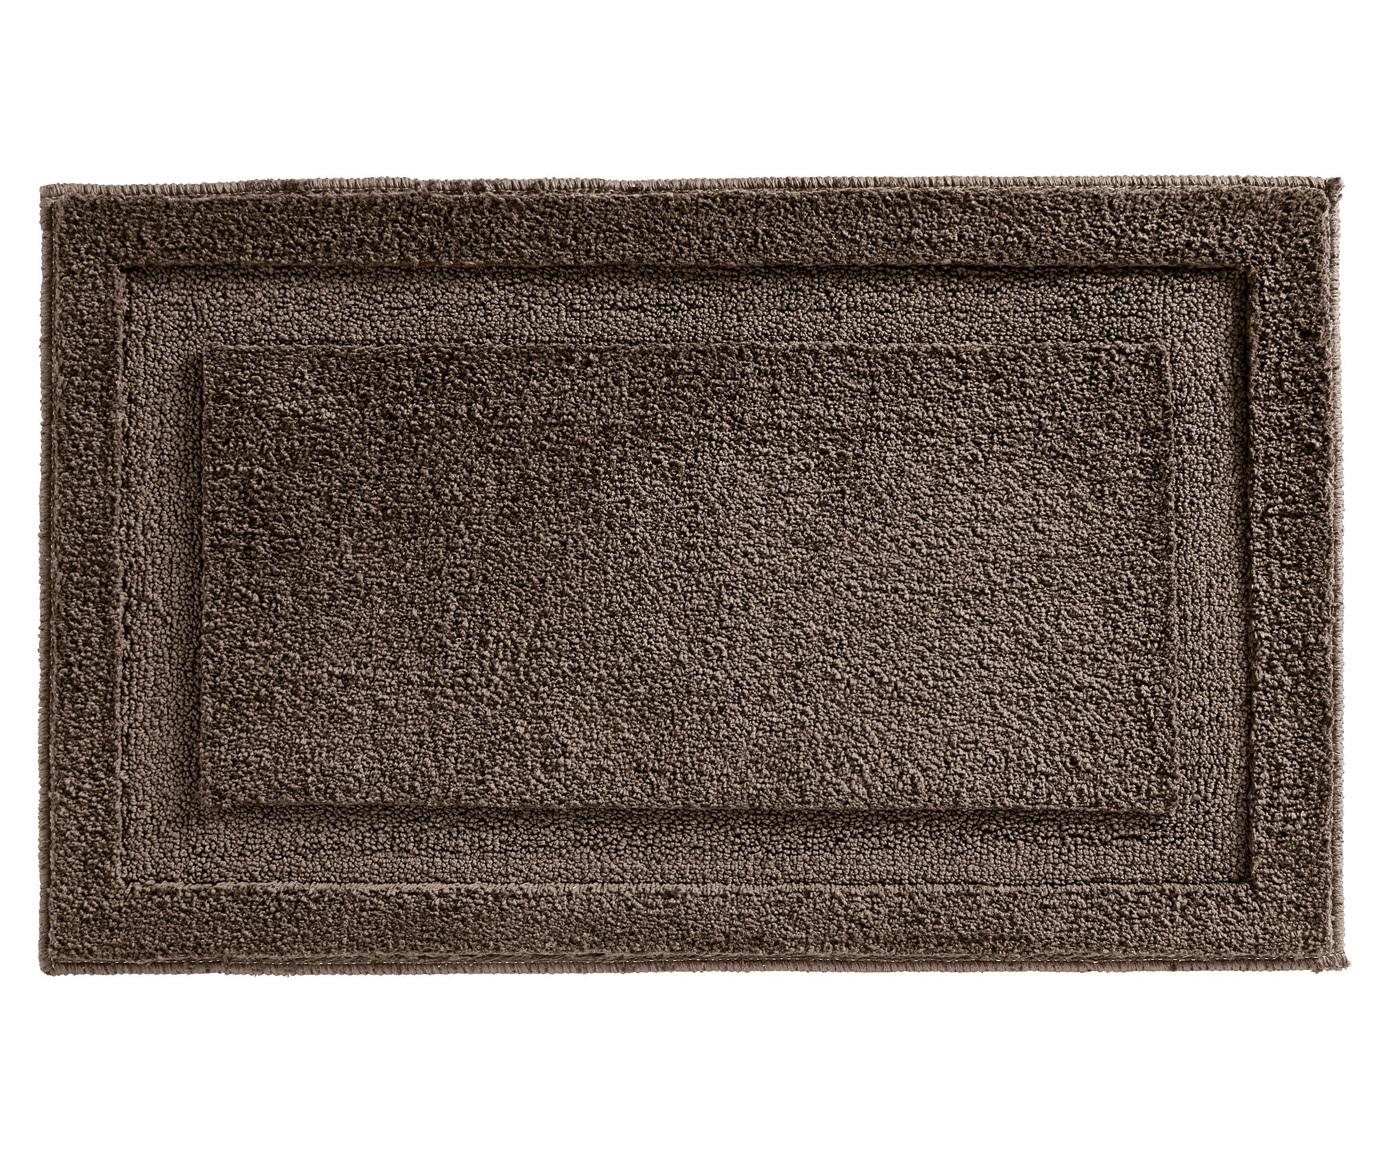 Коврик для ванной коричневого цвета 53х86